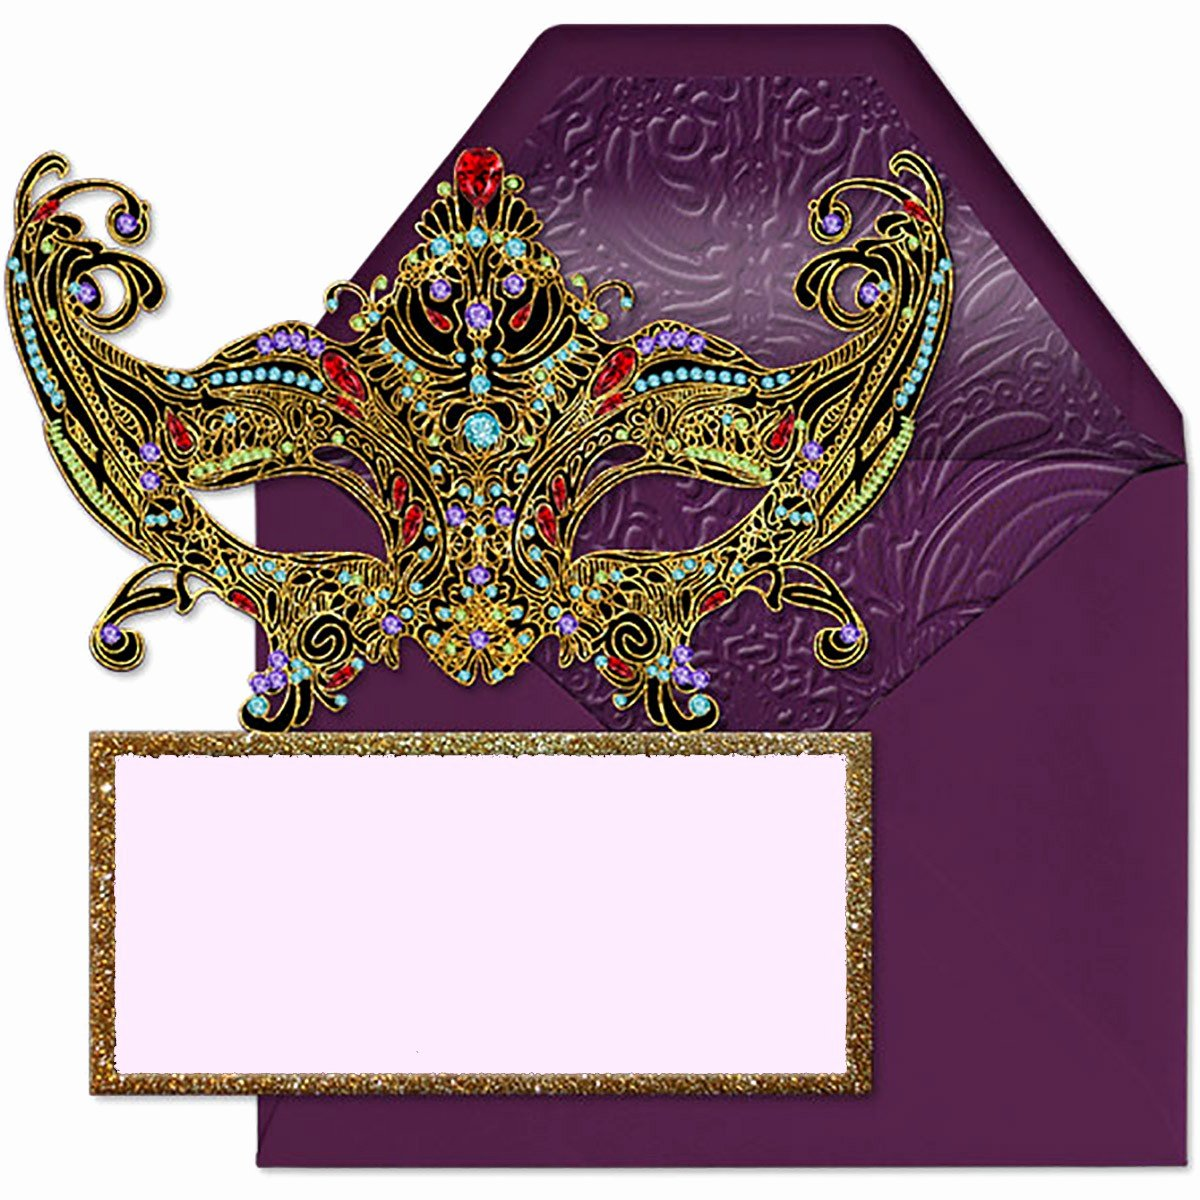 Masquerade Invitation Template Free Luxury Free Printable Masquerade Invitation Templates